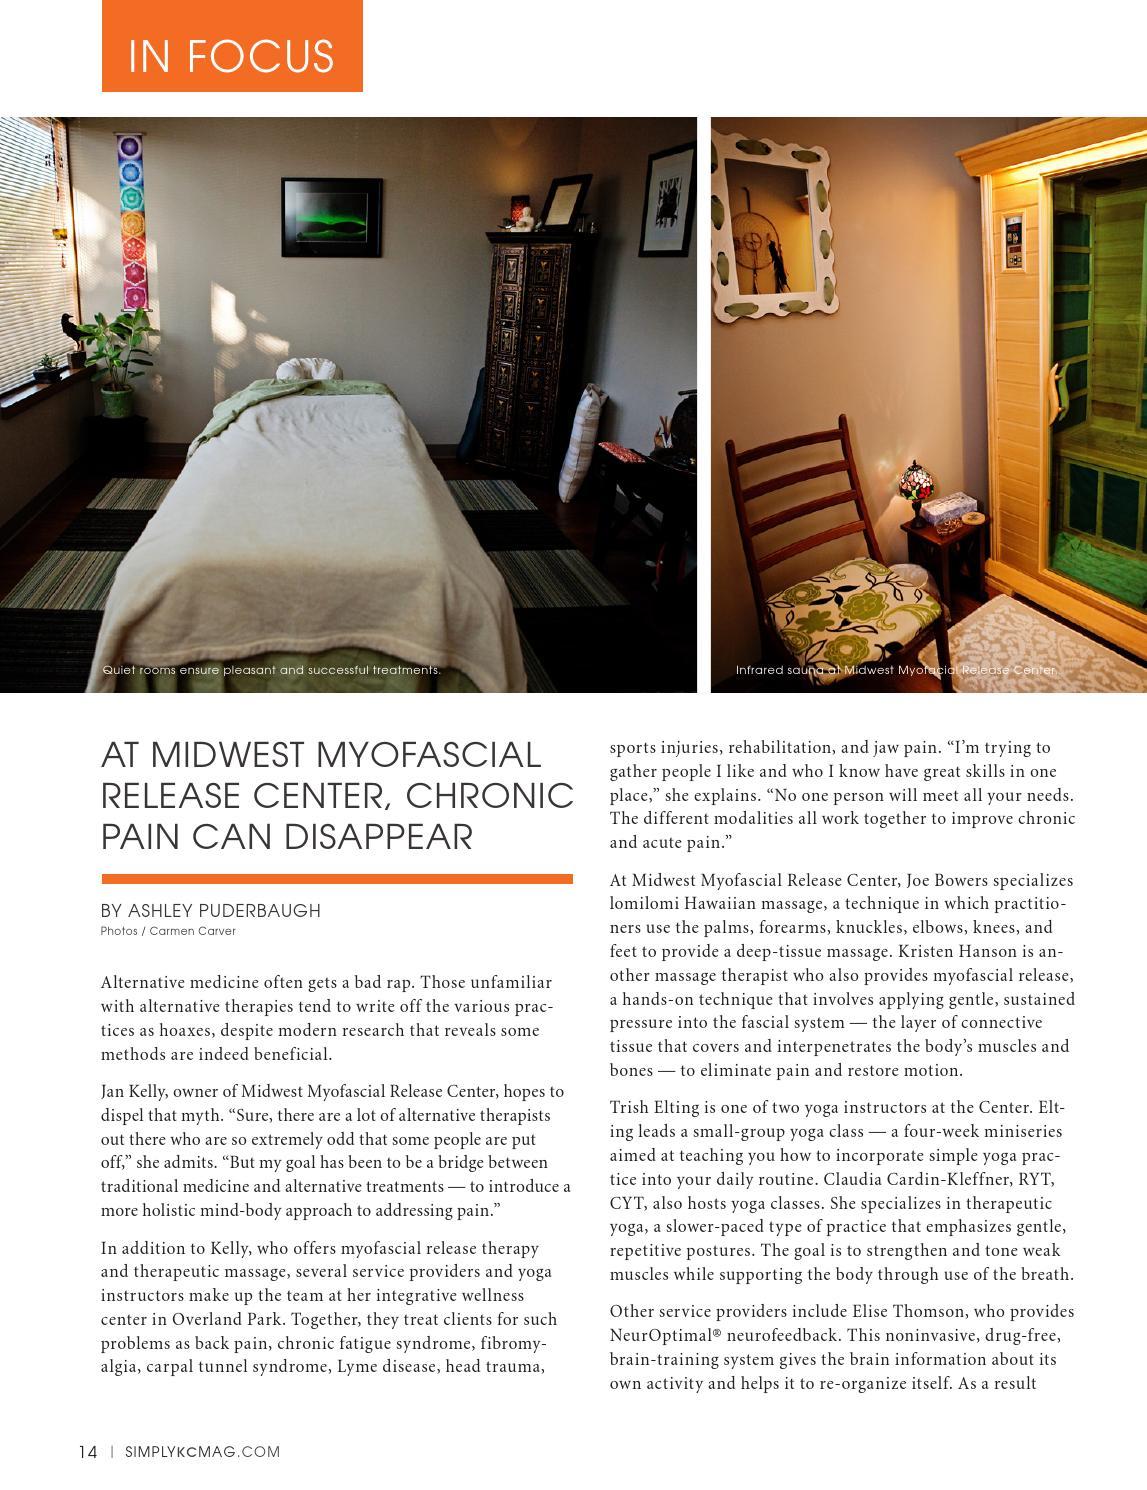 SIMPLYkc Magazine December 2014